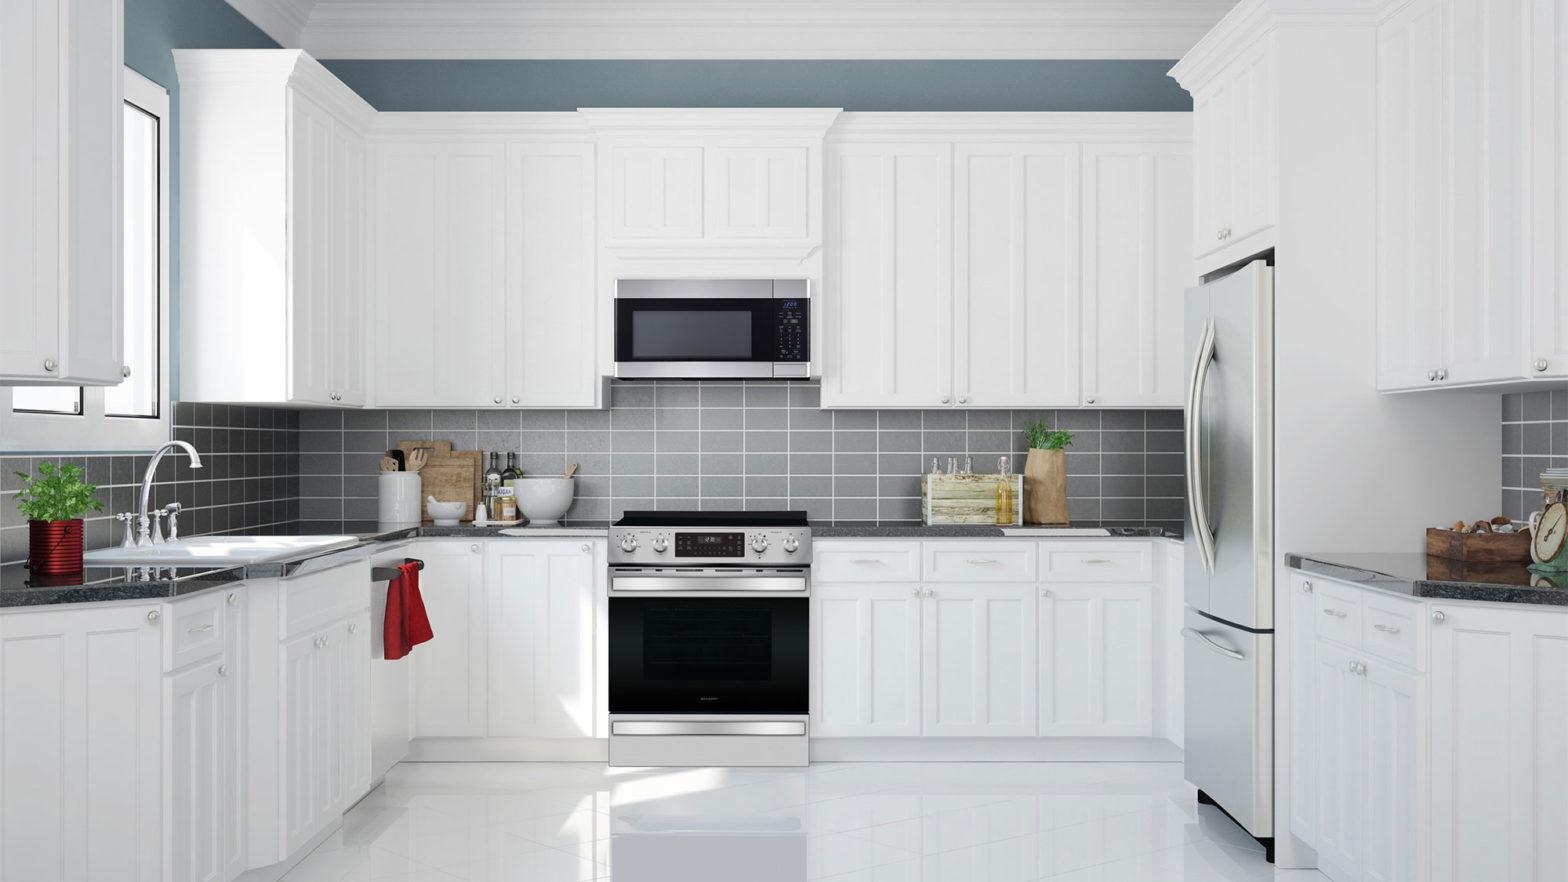 Sharp Full Built-in Kitchen Suite